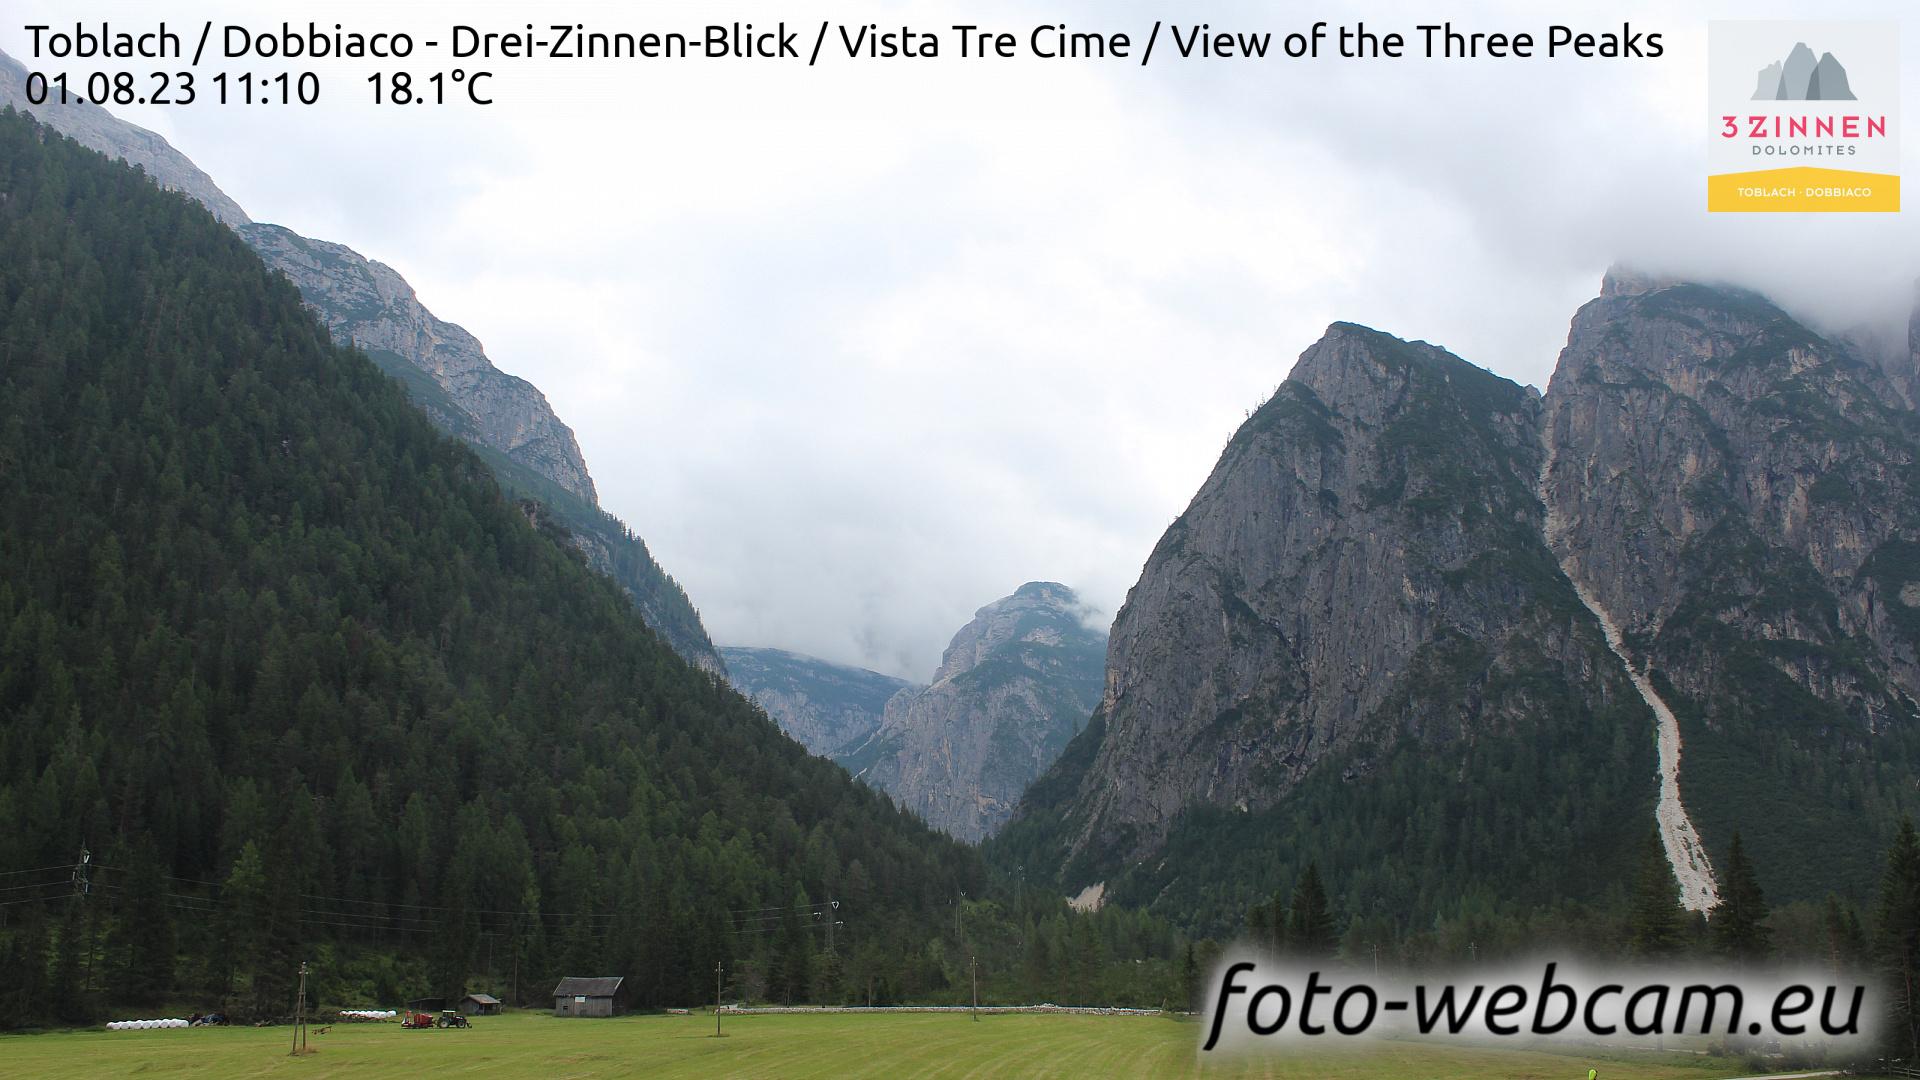 Toblach (Dolomites) Tue. 11:27